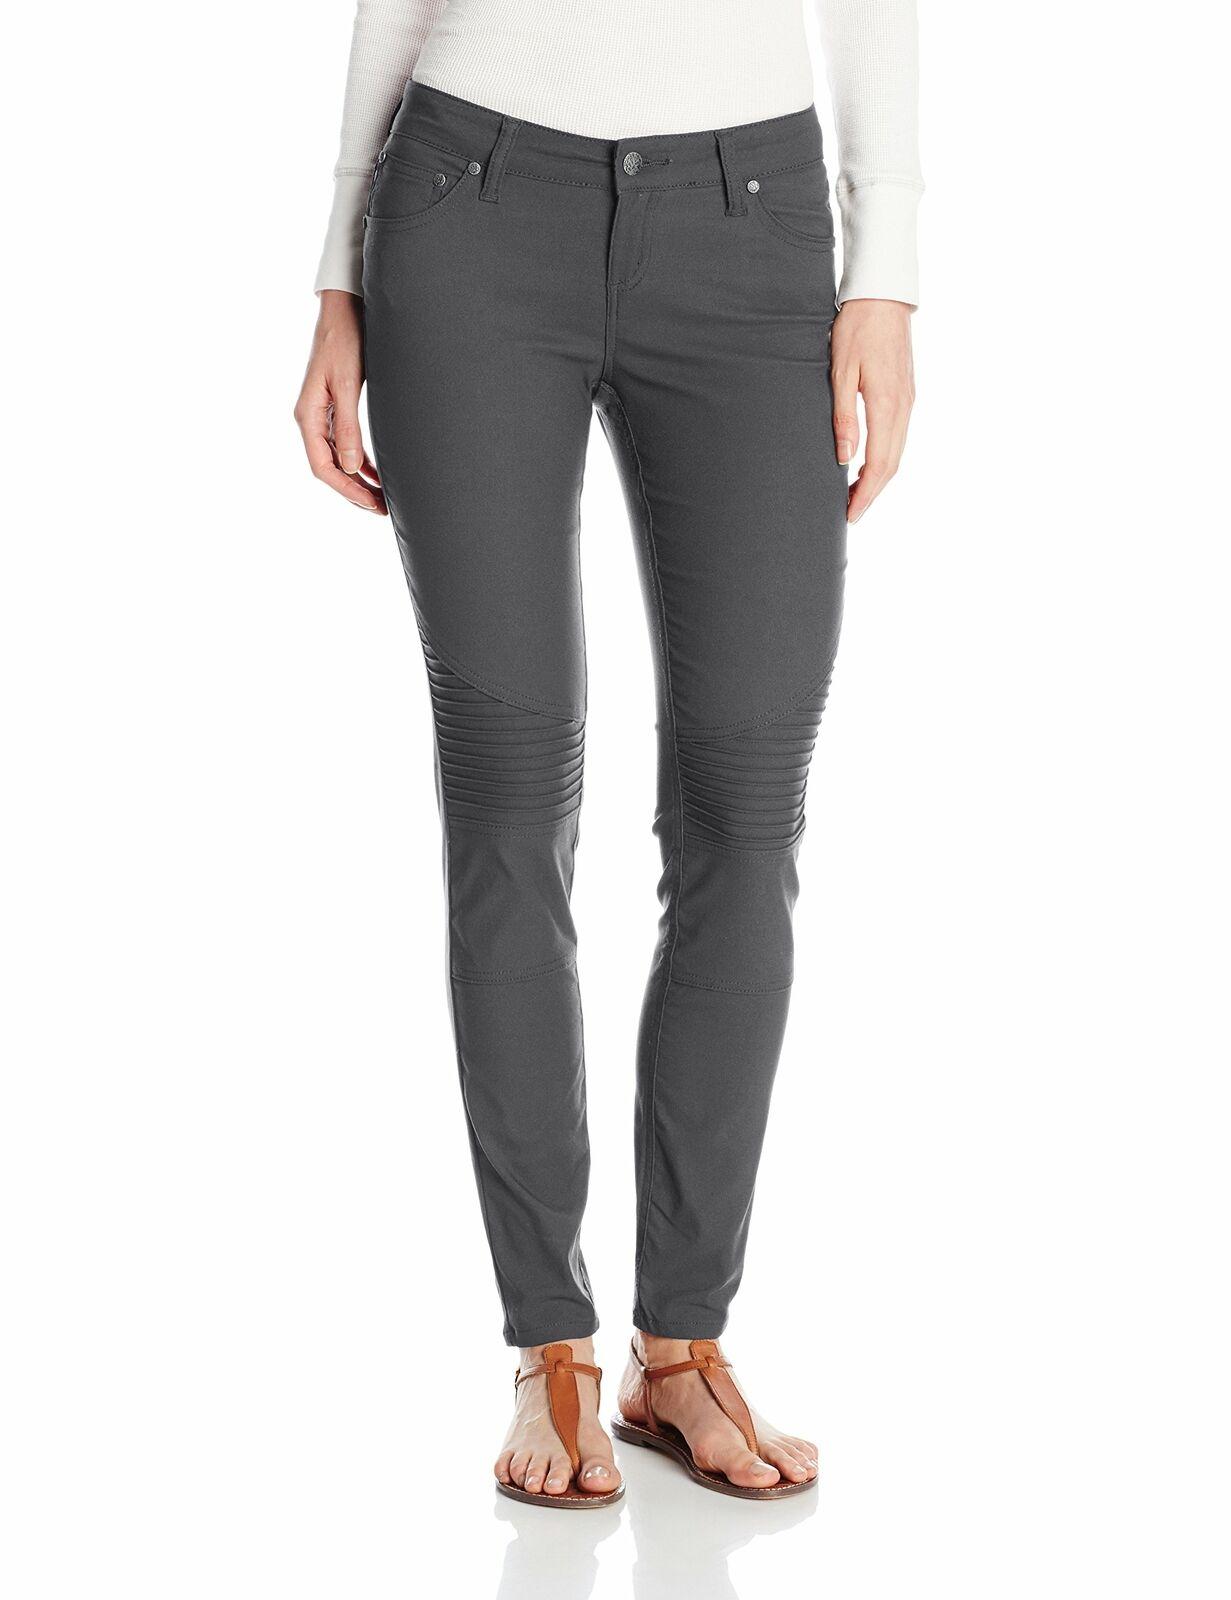 Femme prAna Brenna Pantalon, Taille 0, Charbon-Choisir Taille couleur